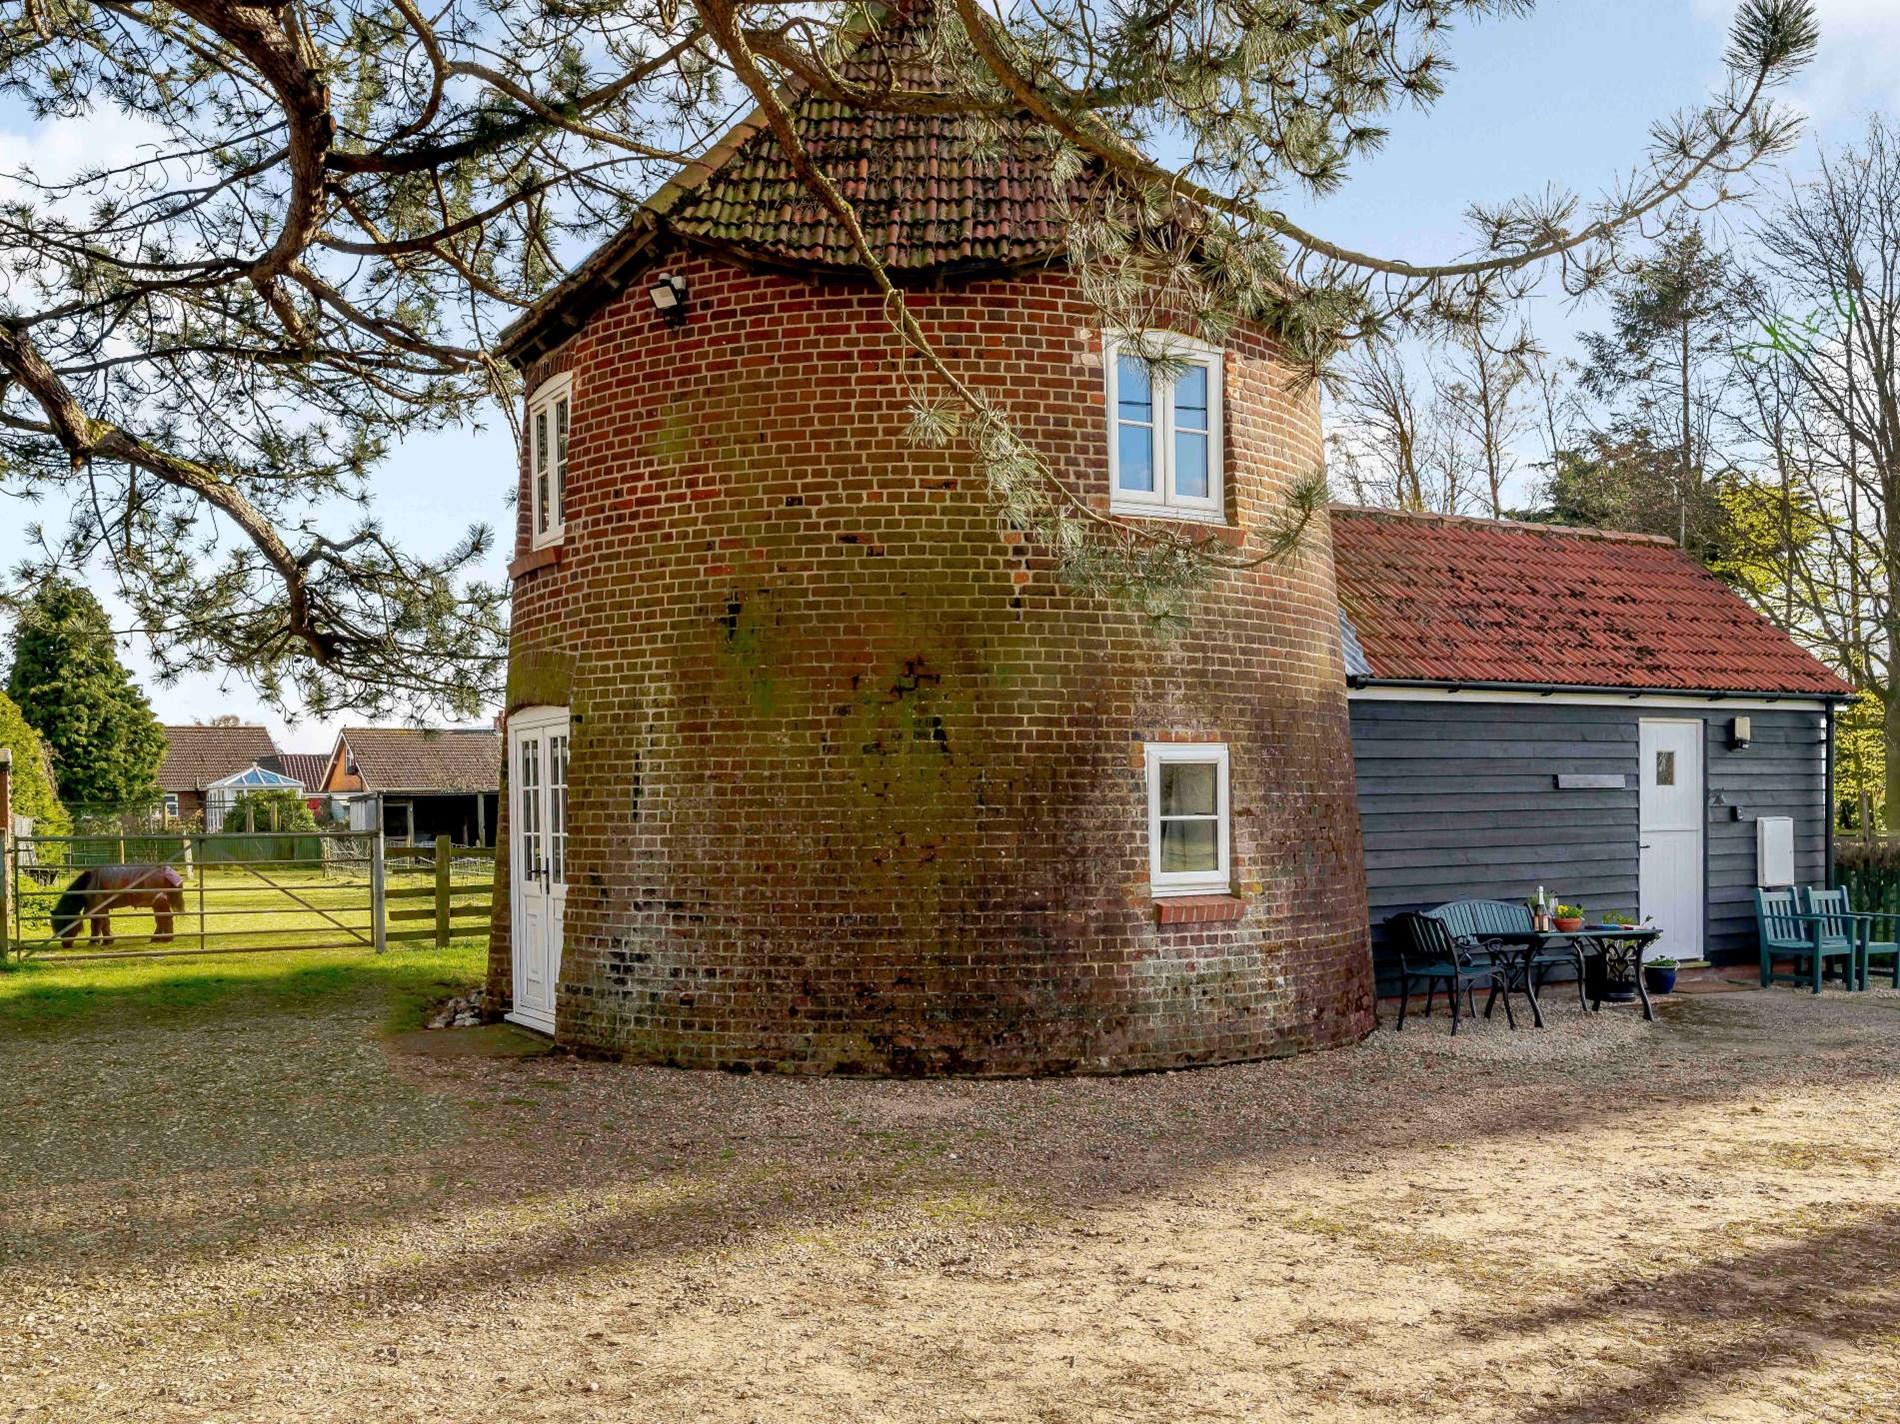 1 Bedroom House in Norfolk, East Anglia